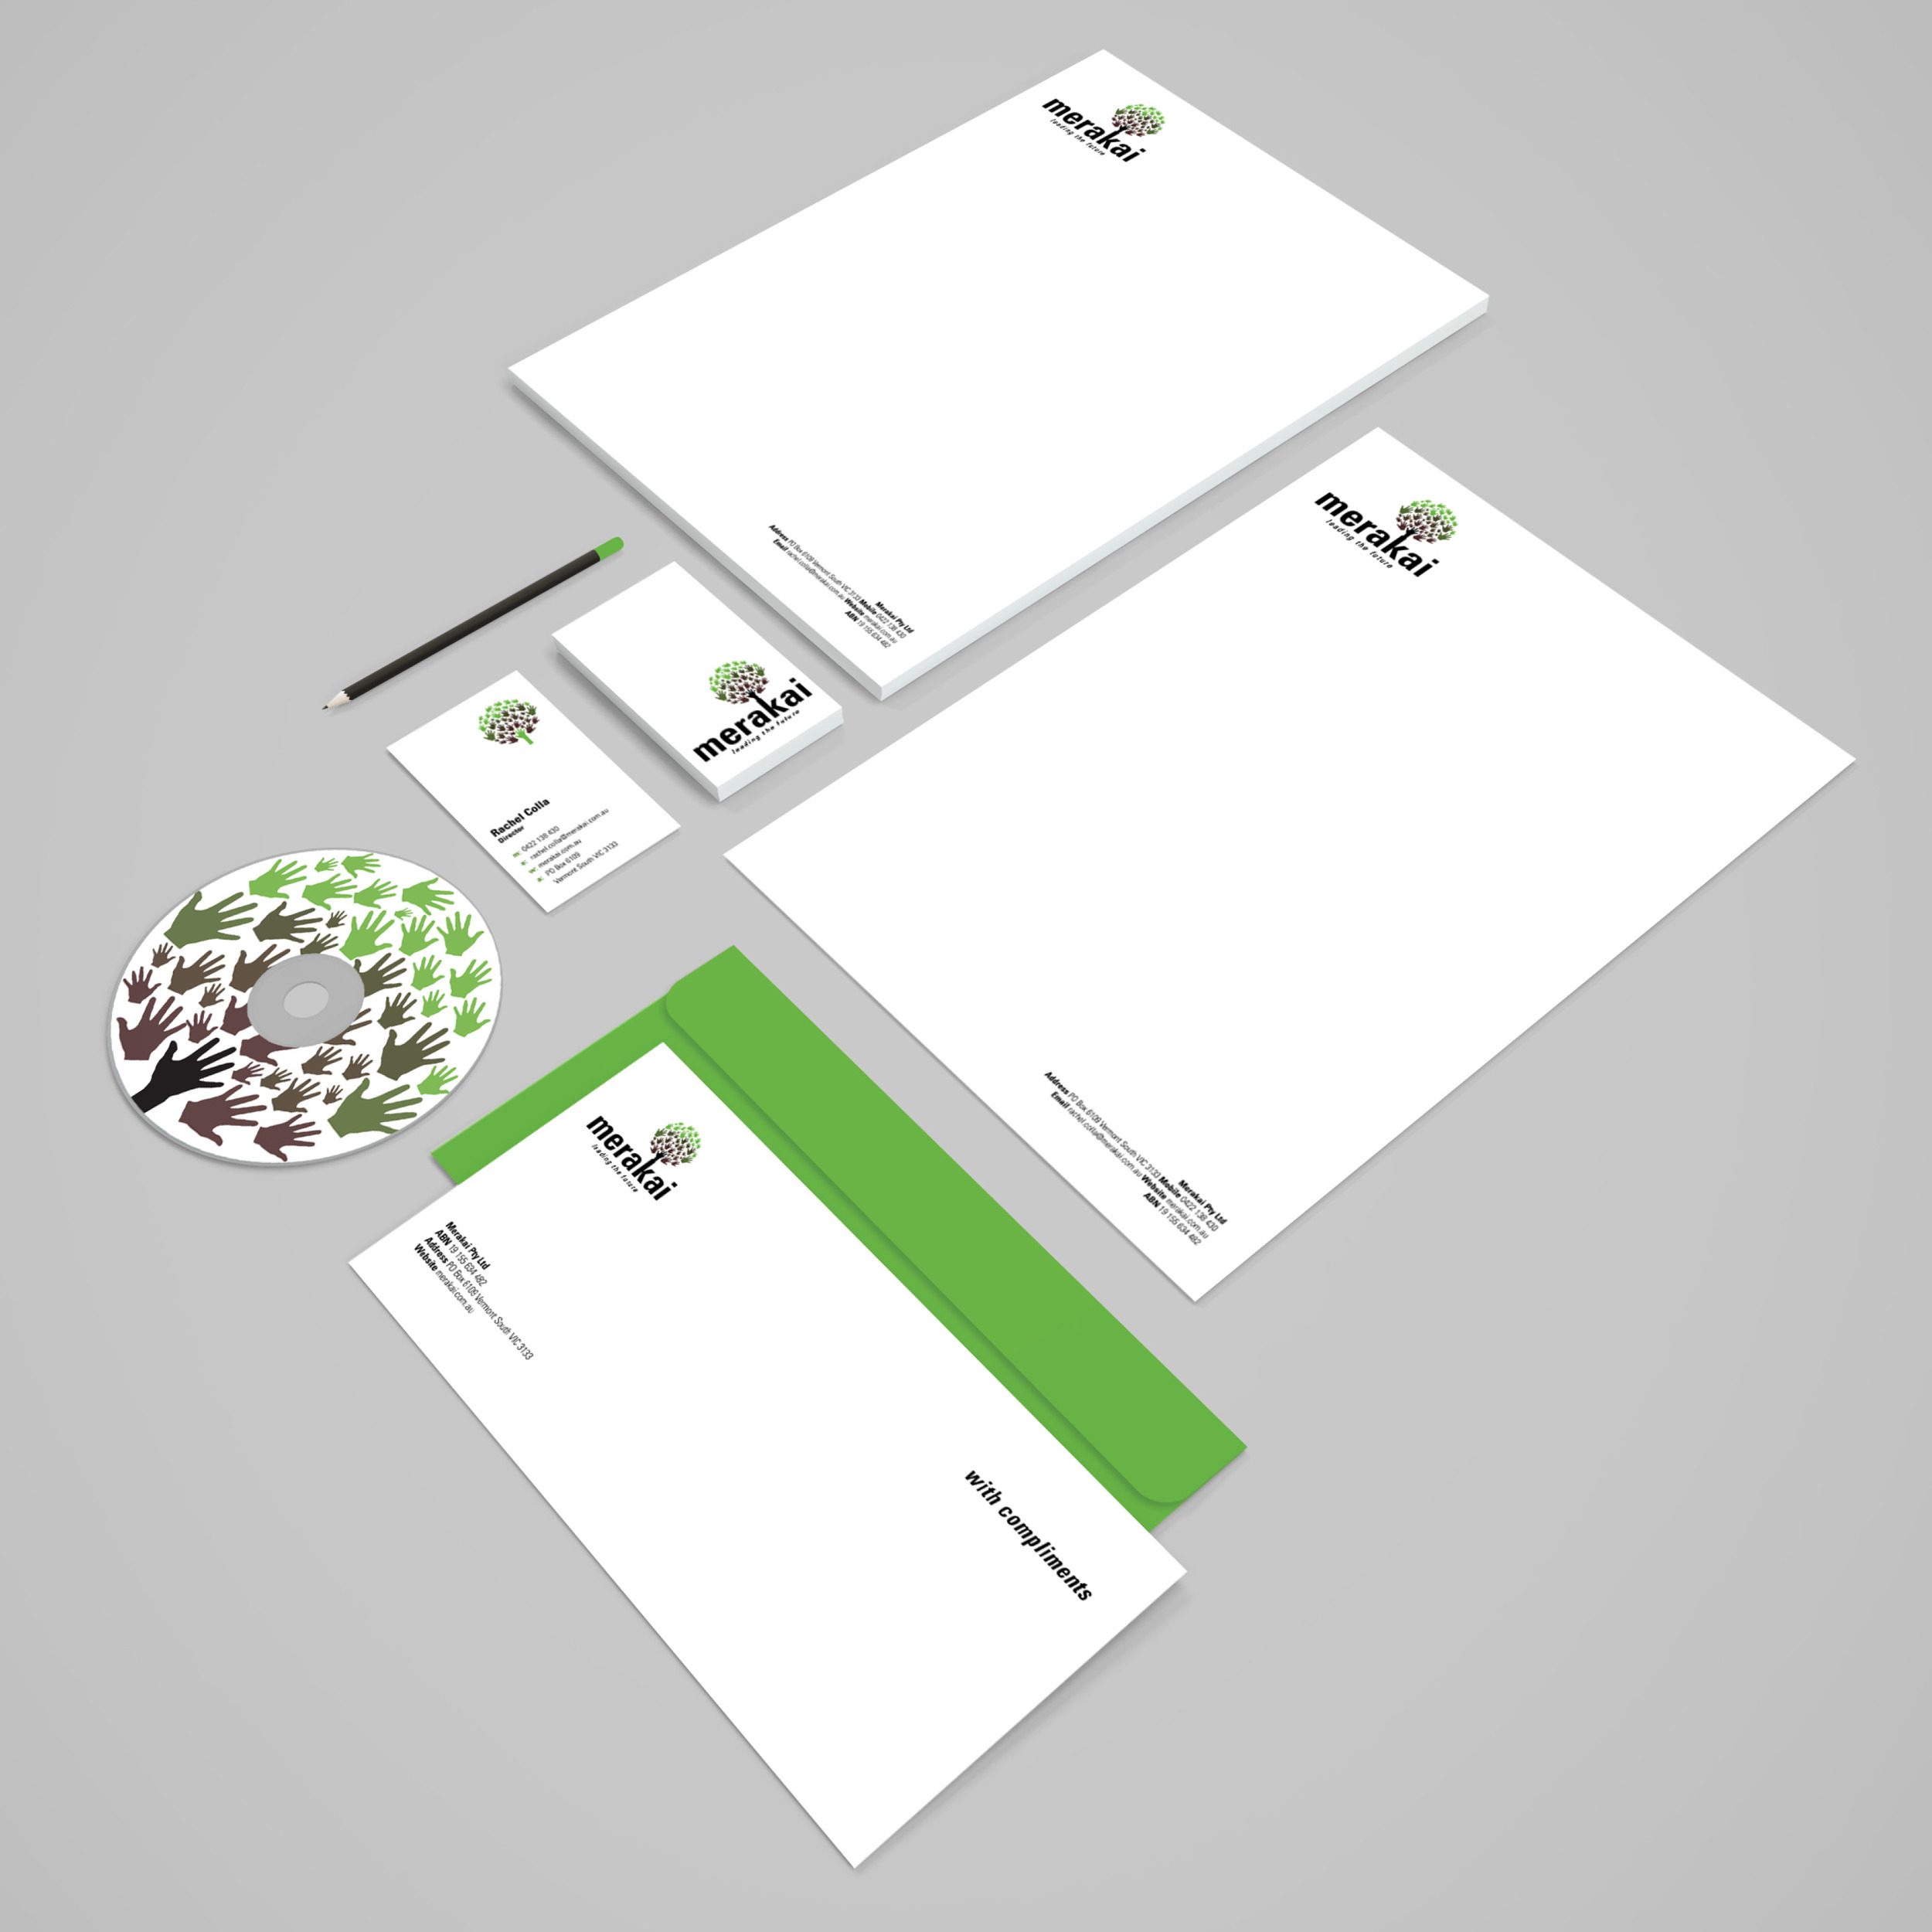 proteus-portfolio11.jpg